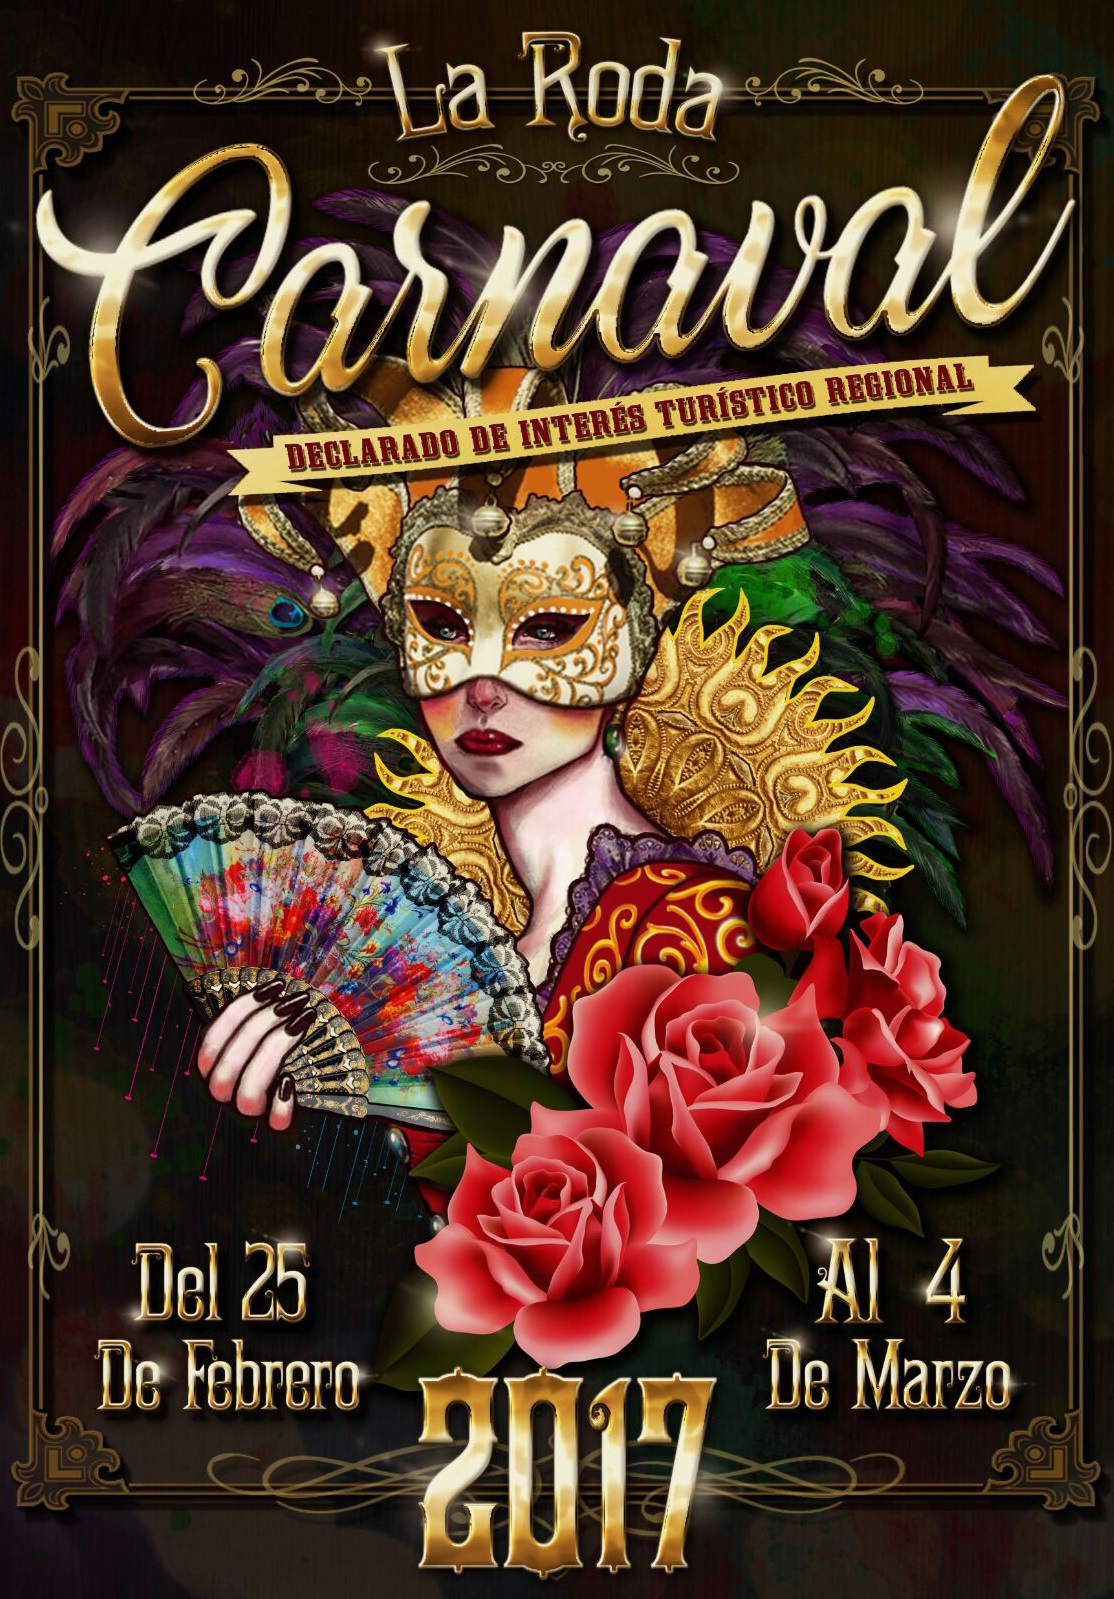 Carnaval 2017 La Roda